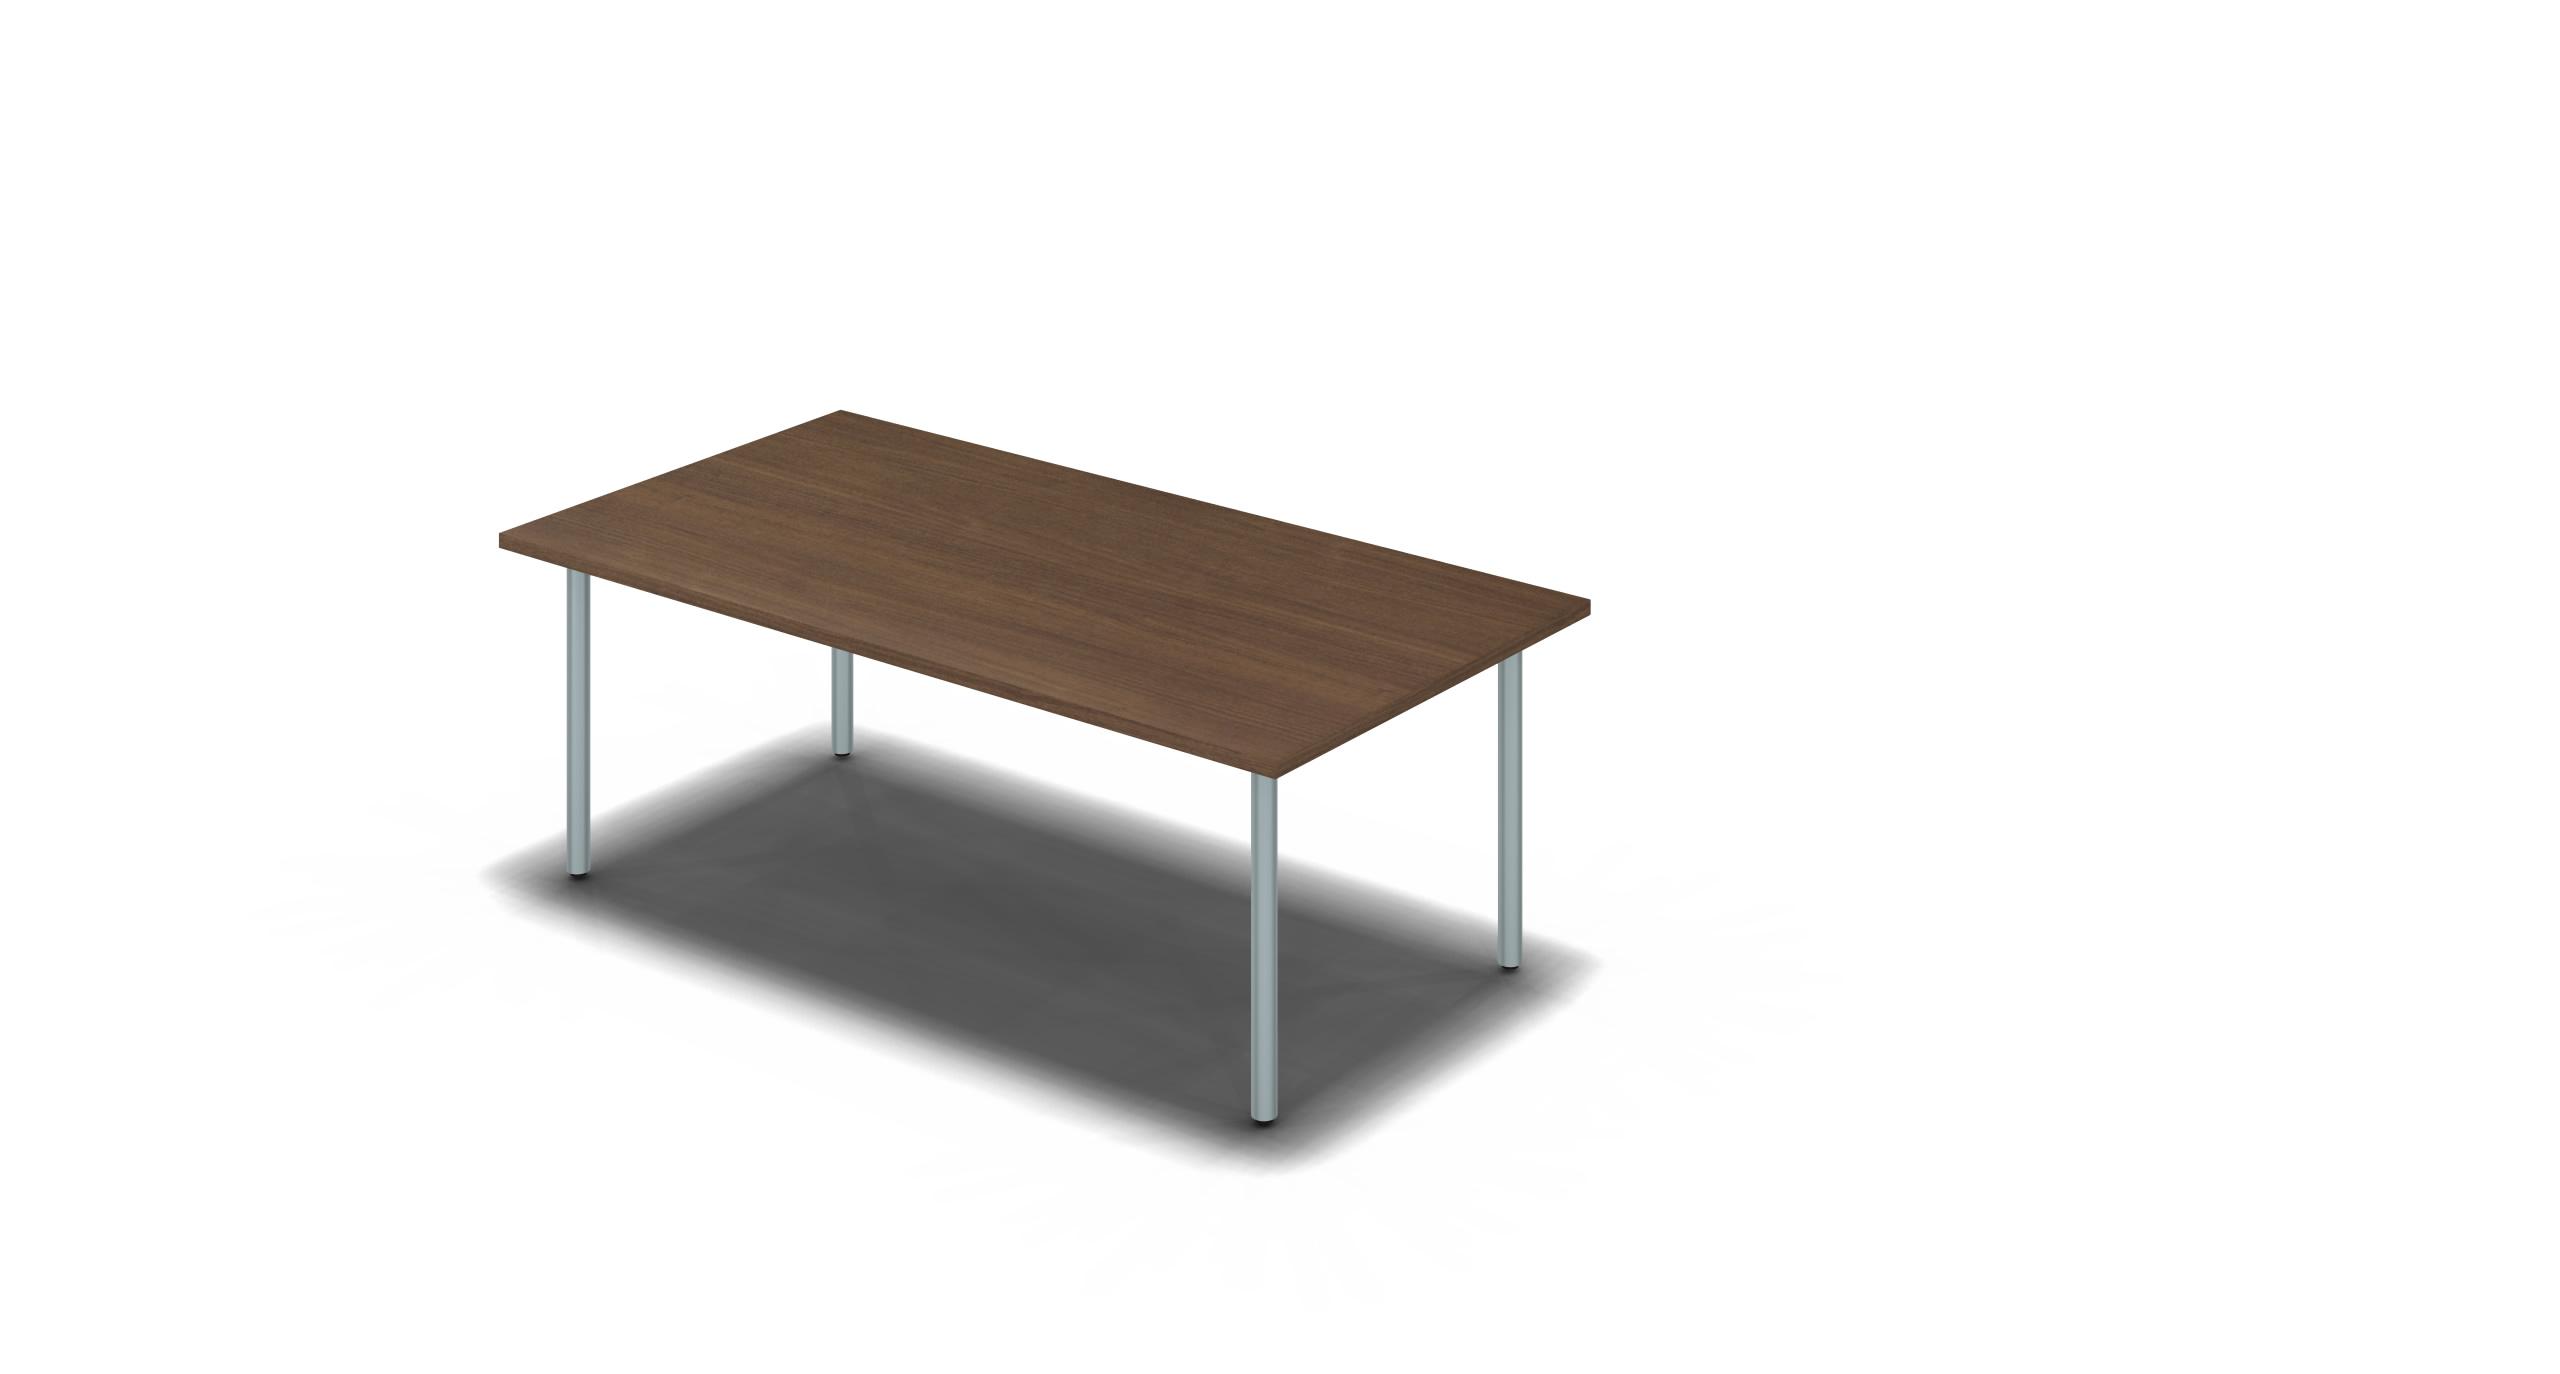 Table_Round_1800x900_Silver_Walnut_noOption